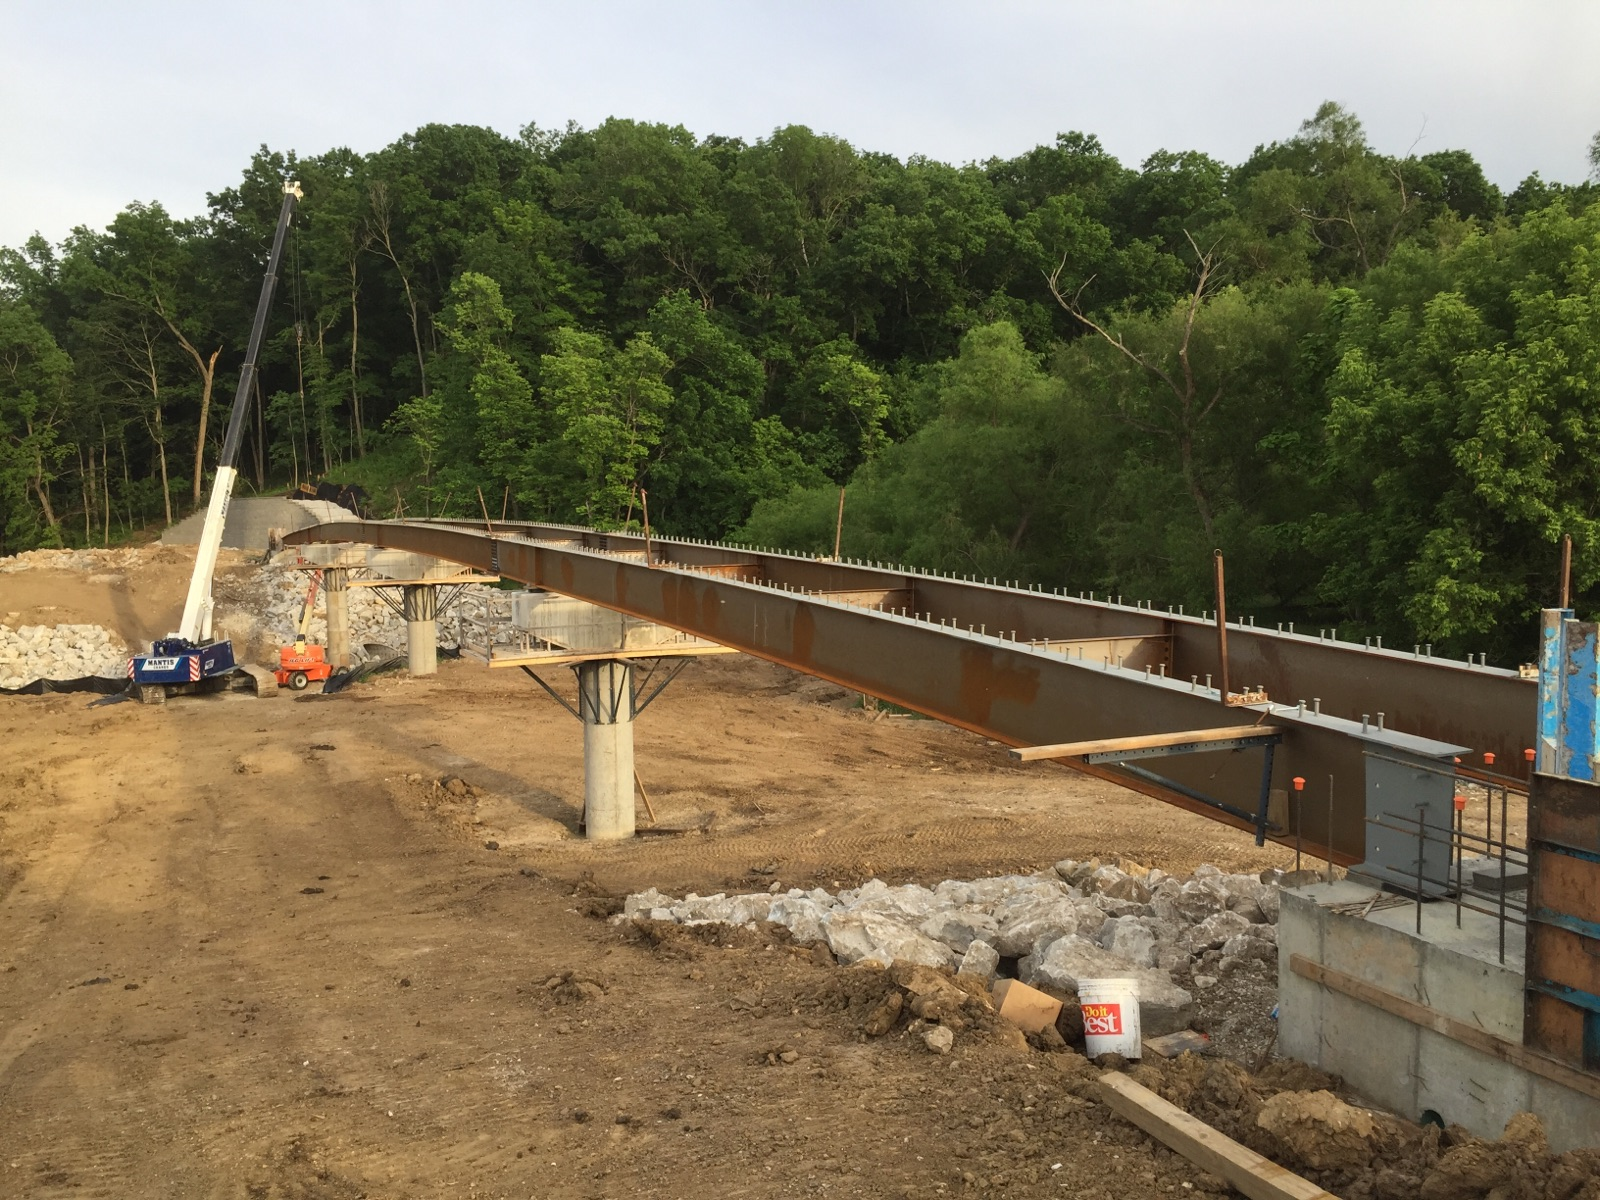 Forum Blvd Trail Bridge over Hinkson Creek, Columbia, MO